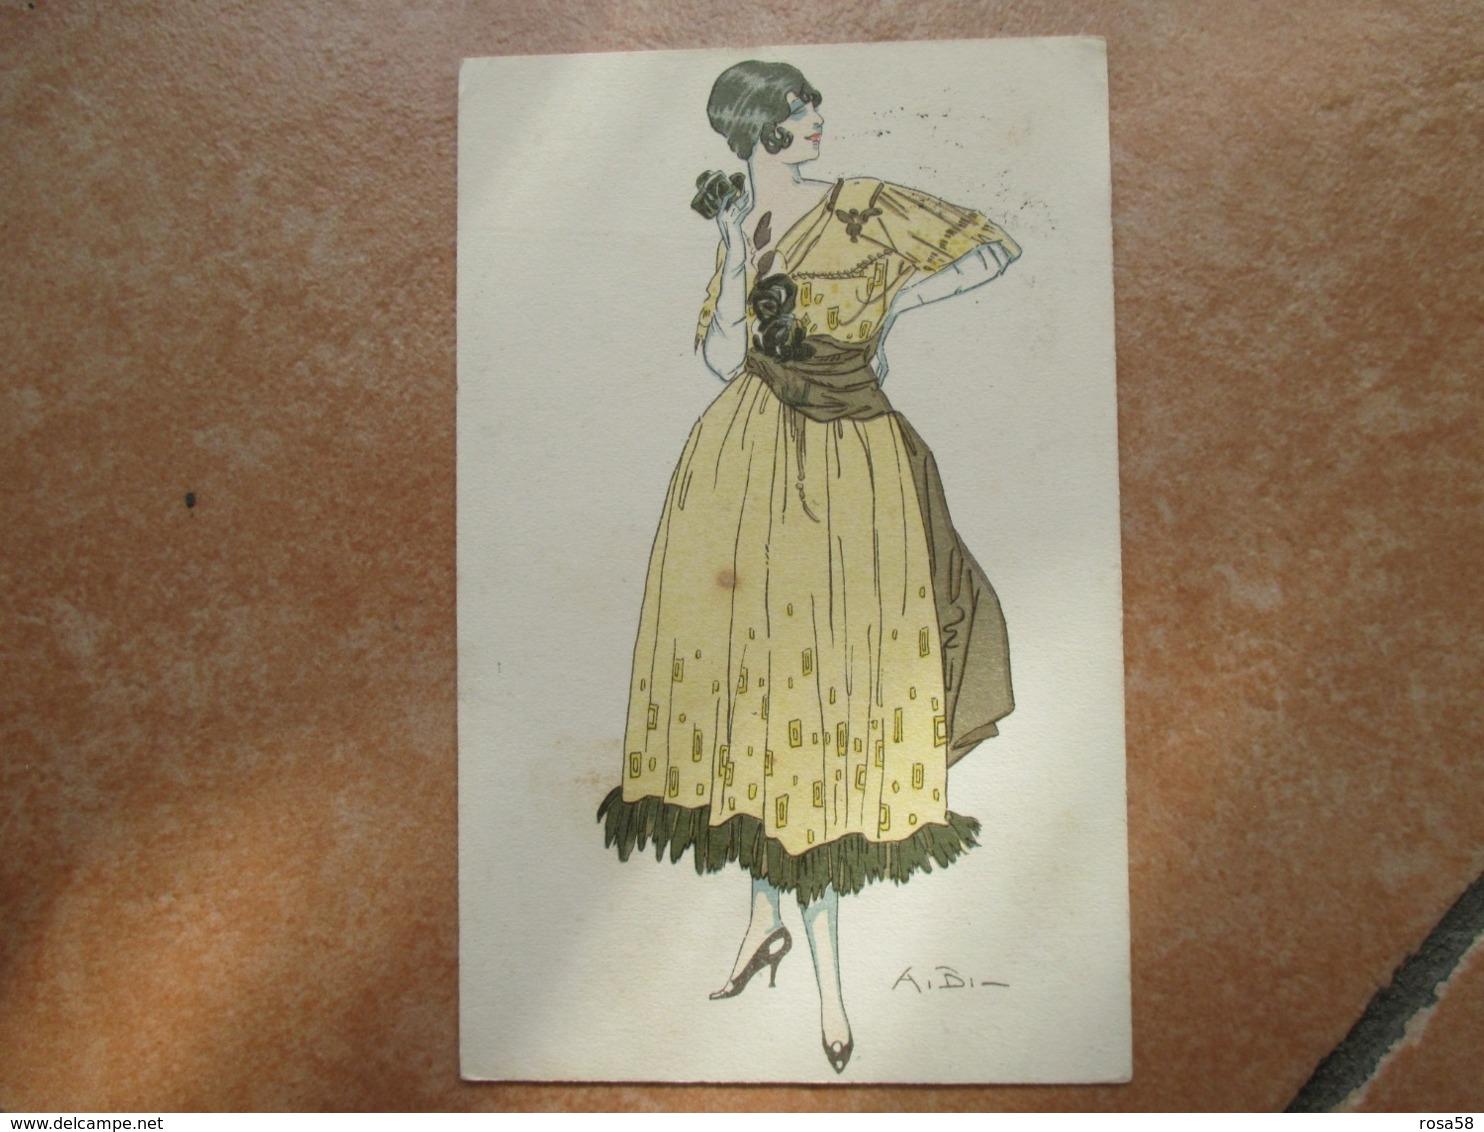 Donnine Woman 1918 Viaggiata Posta Militare Illustratore A.BI. - Künstlerkarten